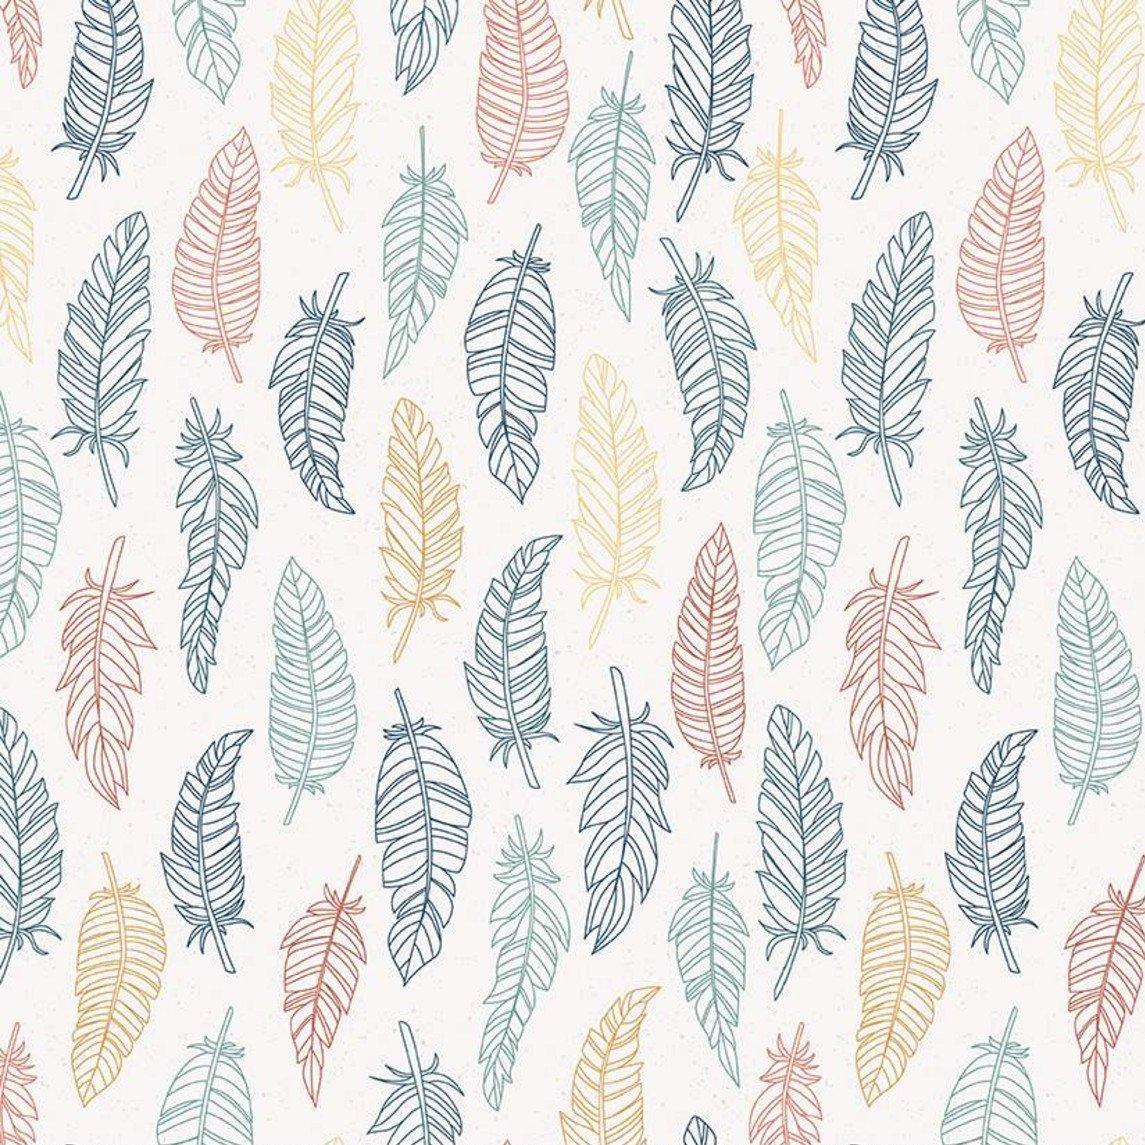 Amanda Castor Dream Weaver - Feathers (Cream)